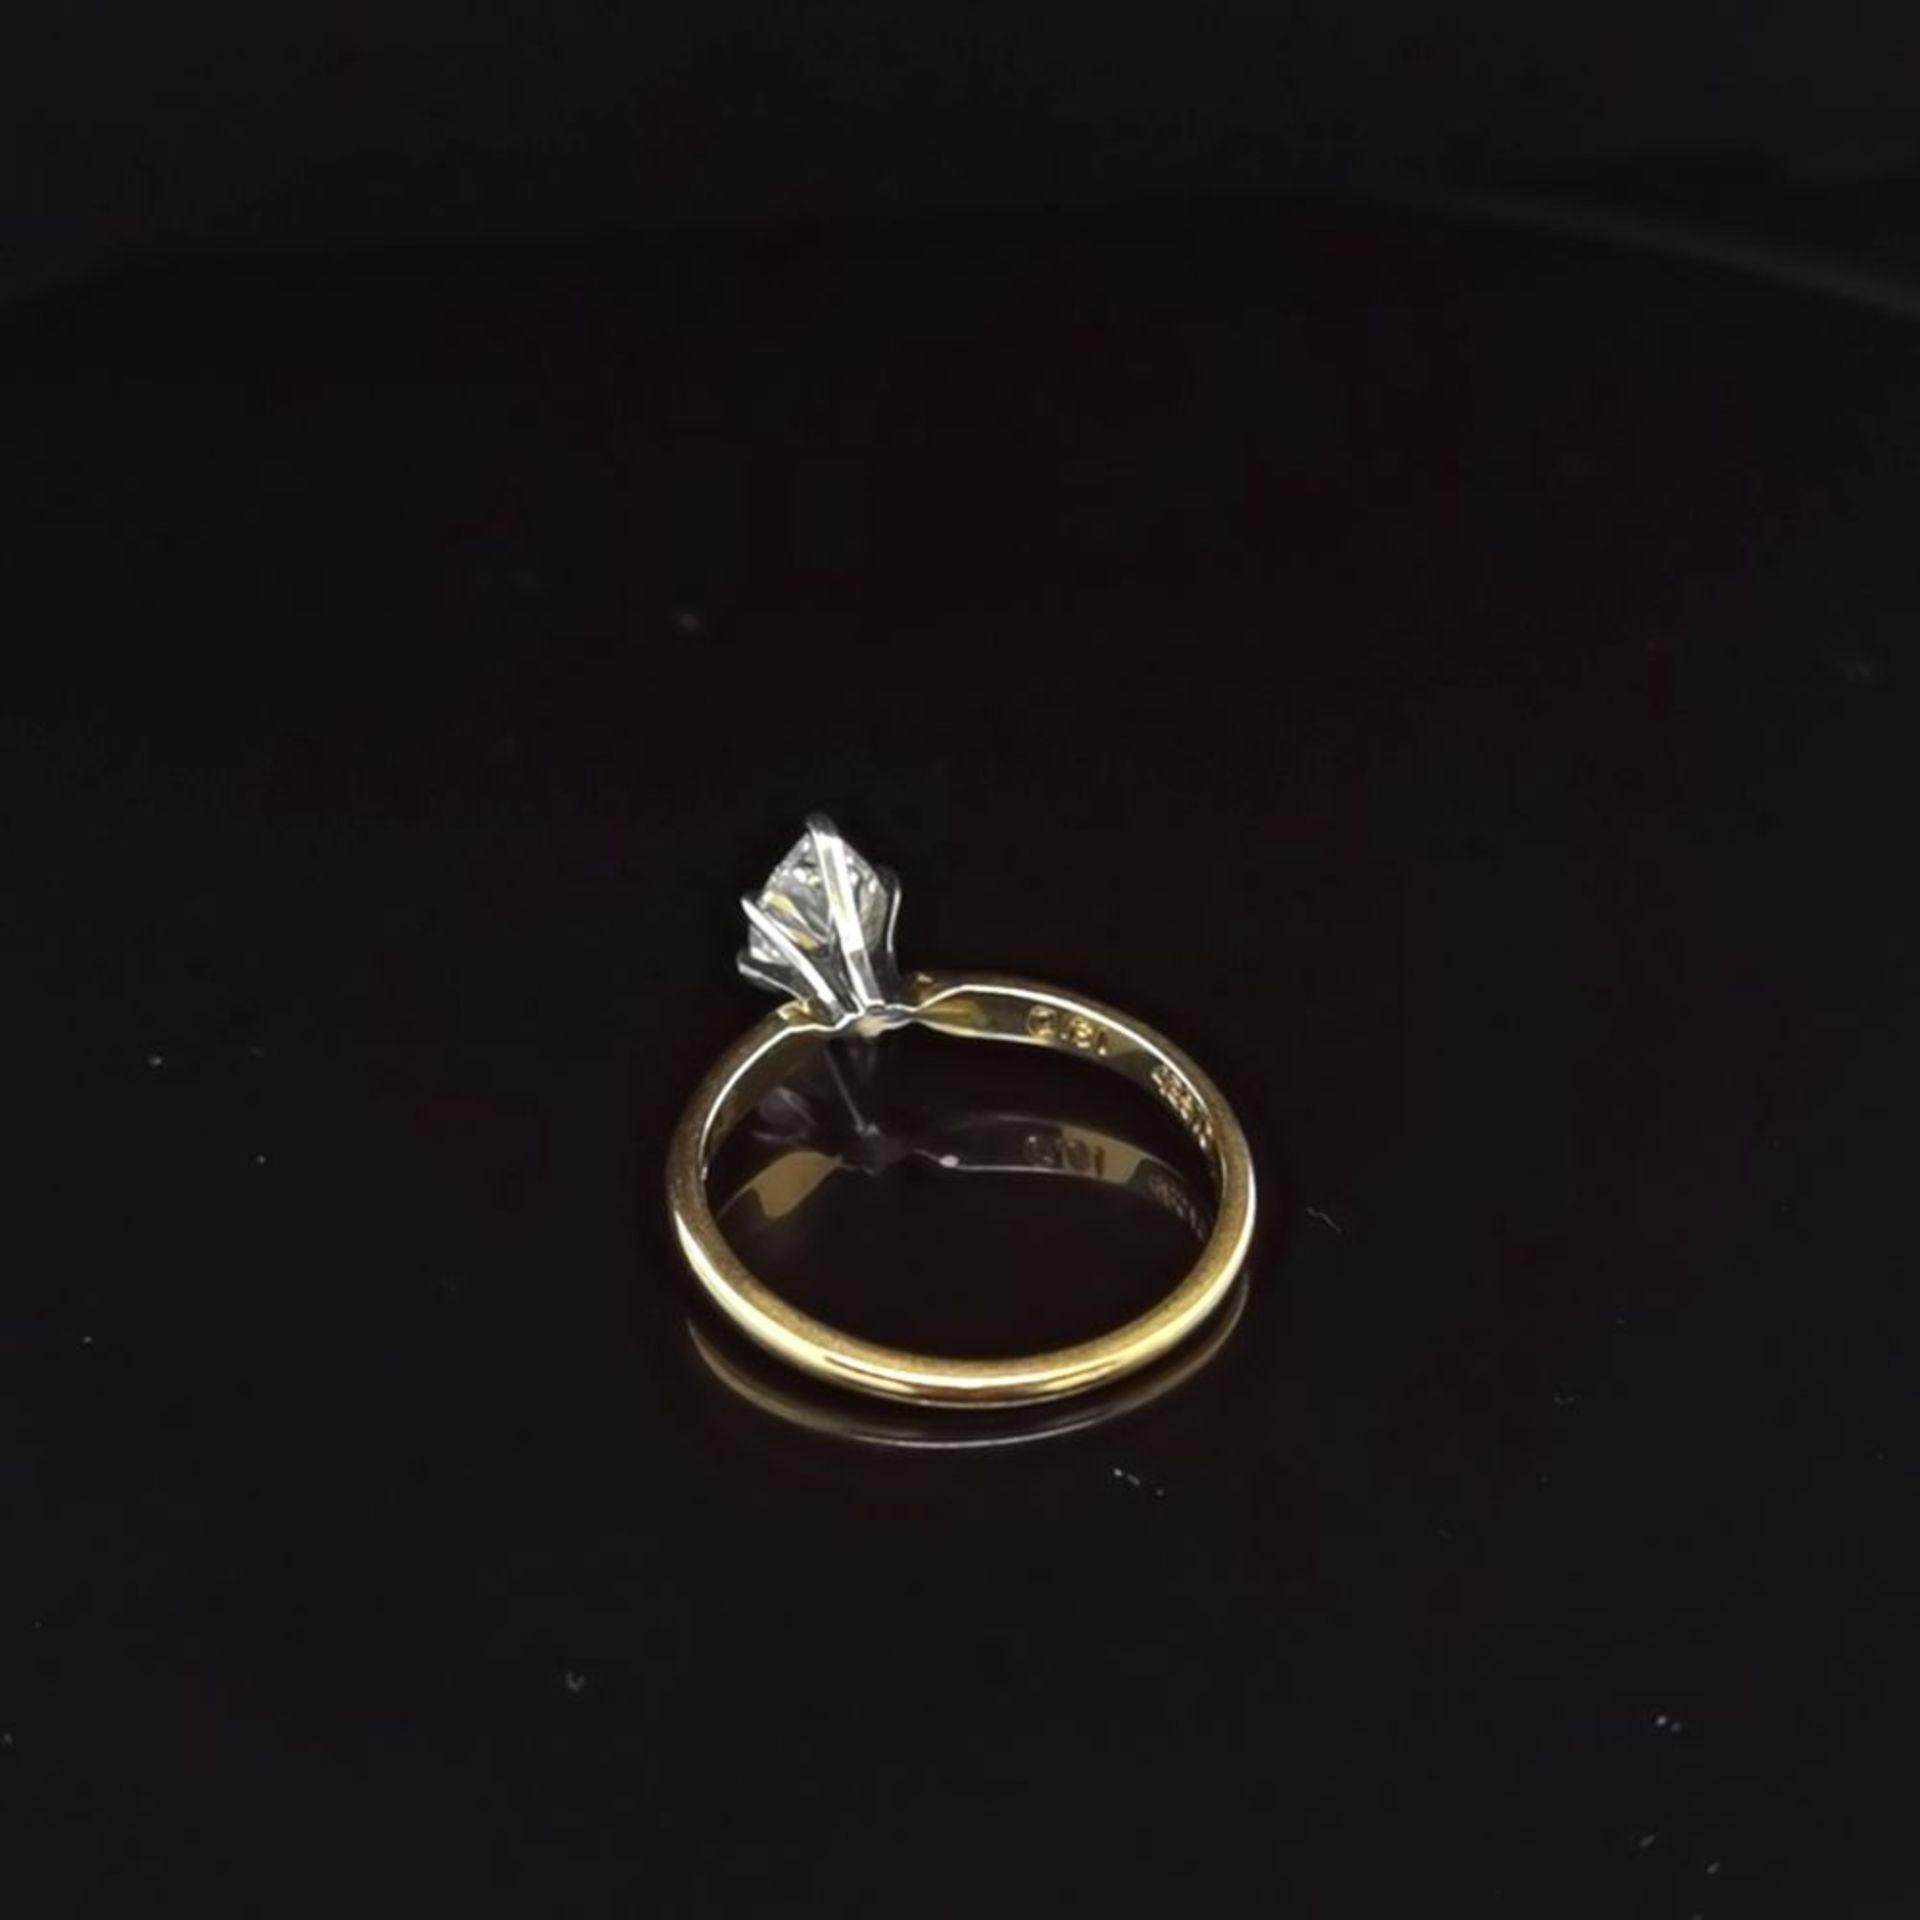 Diamant-Solitaire, 750 Gelbgold 2,5 - Image 3 of 3